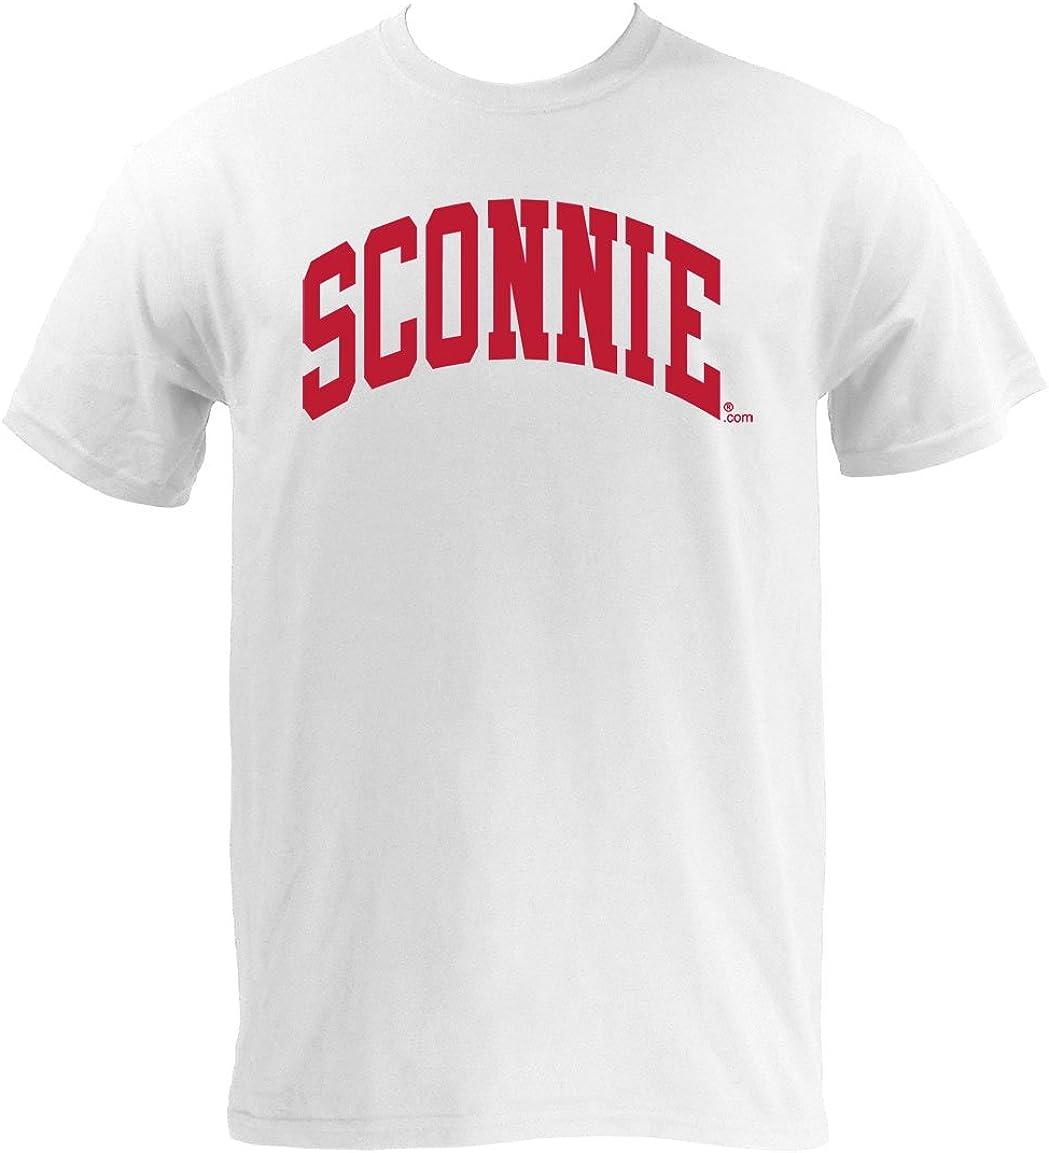 Sconnie Original, Wisconsin Pride T Shirt